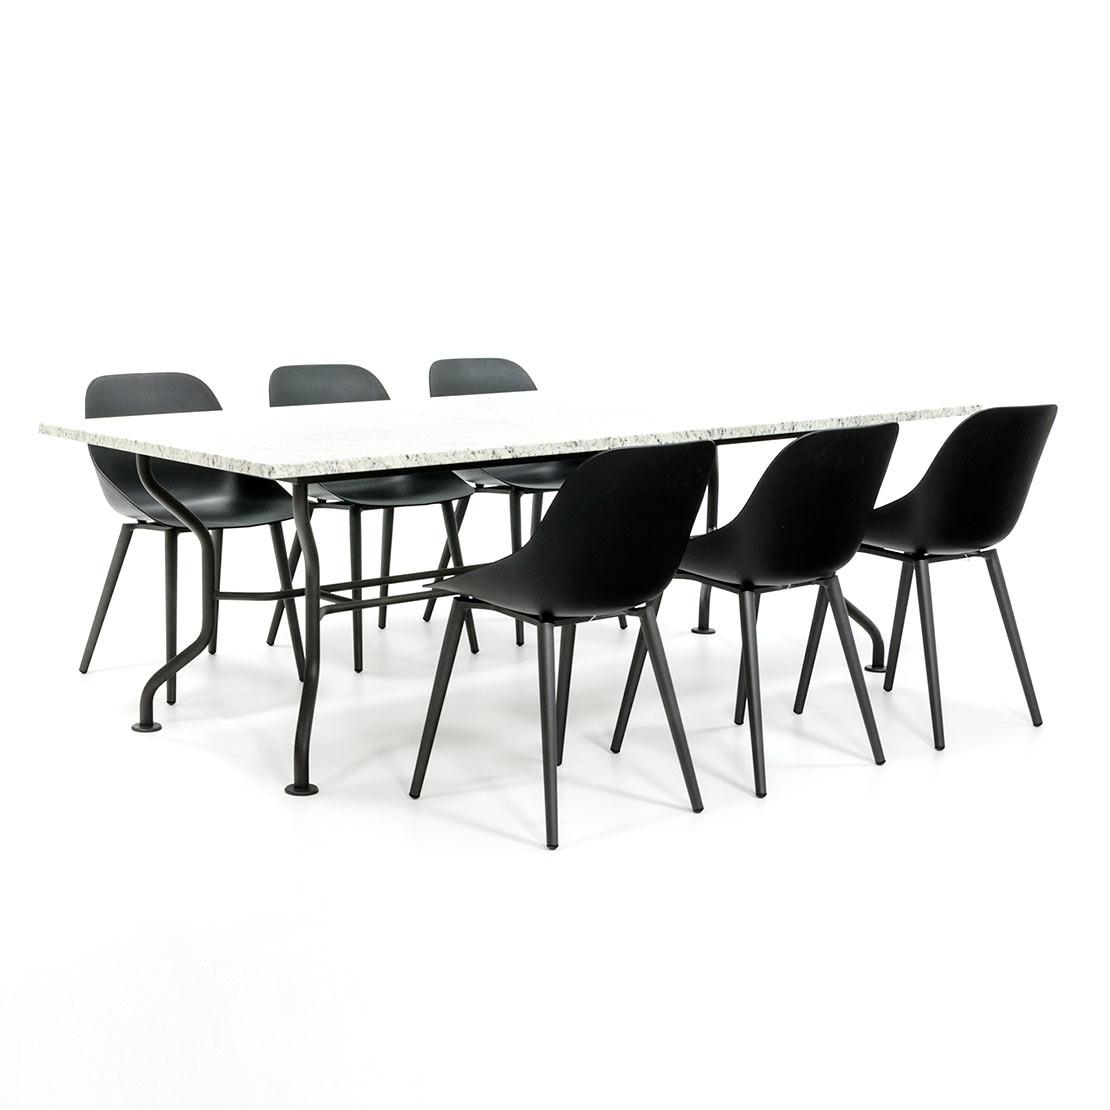 Stevige tuintafel met design stoelen